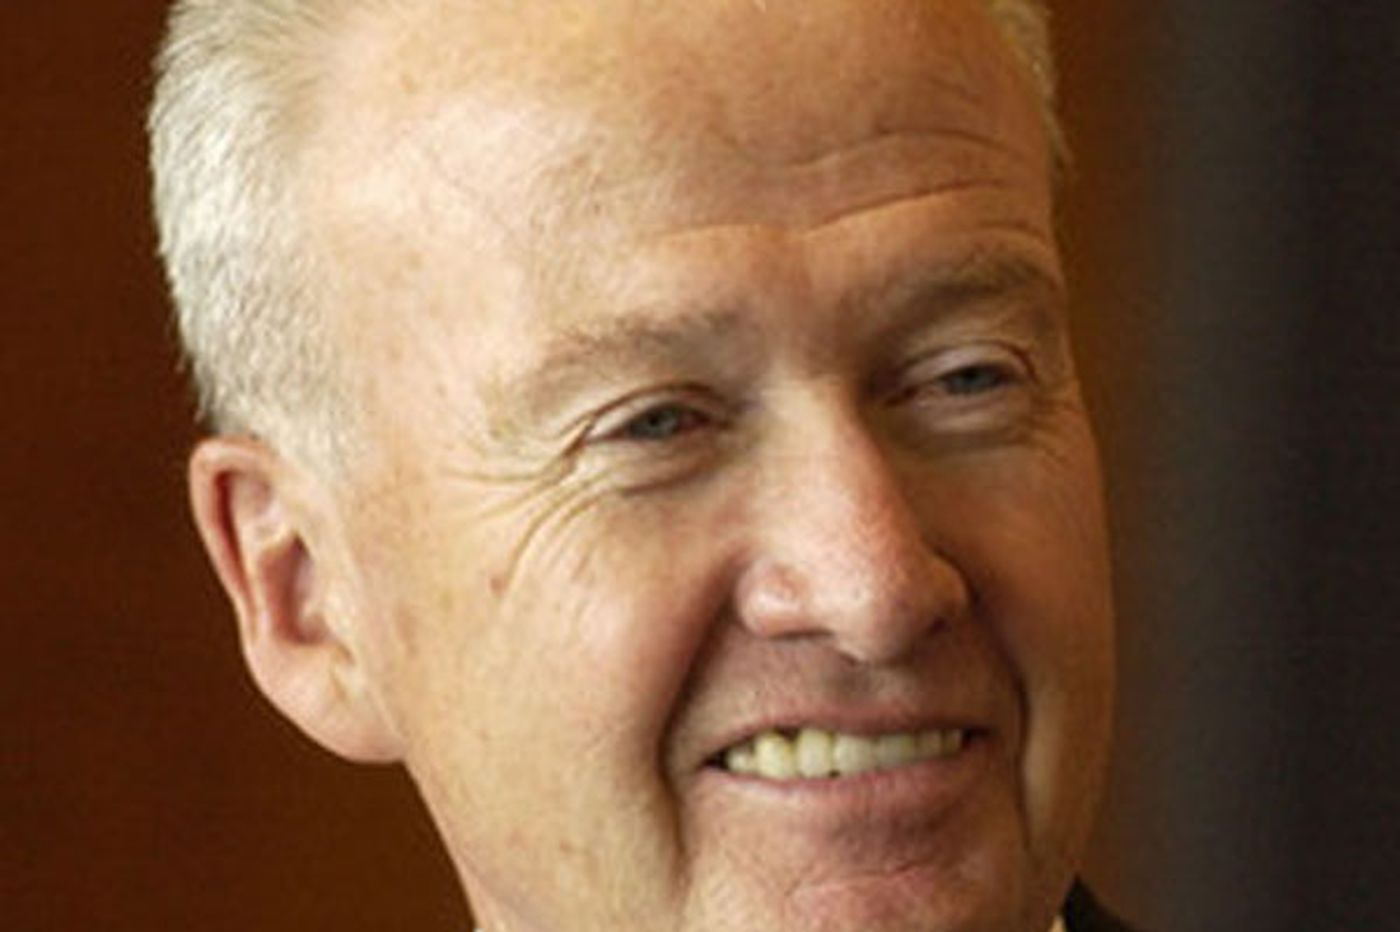 Former Sunoco exec to fund $2.5M Villanova engineering lab